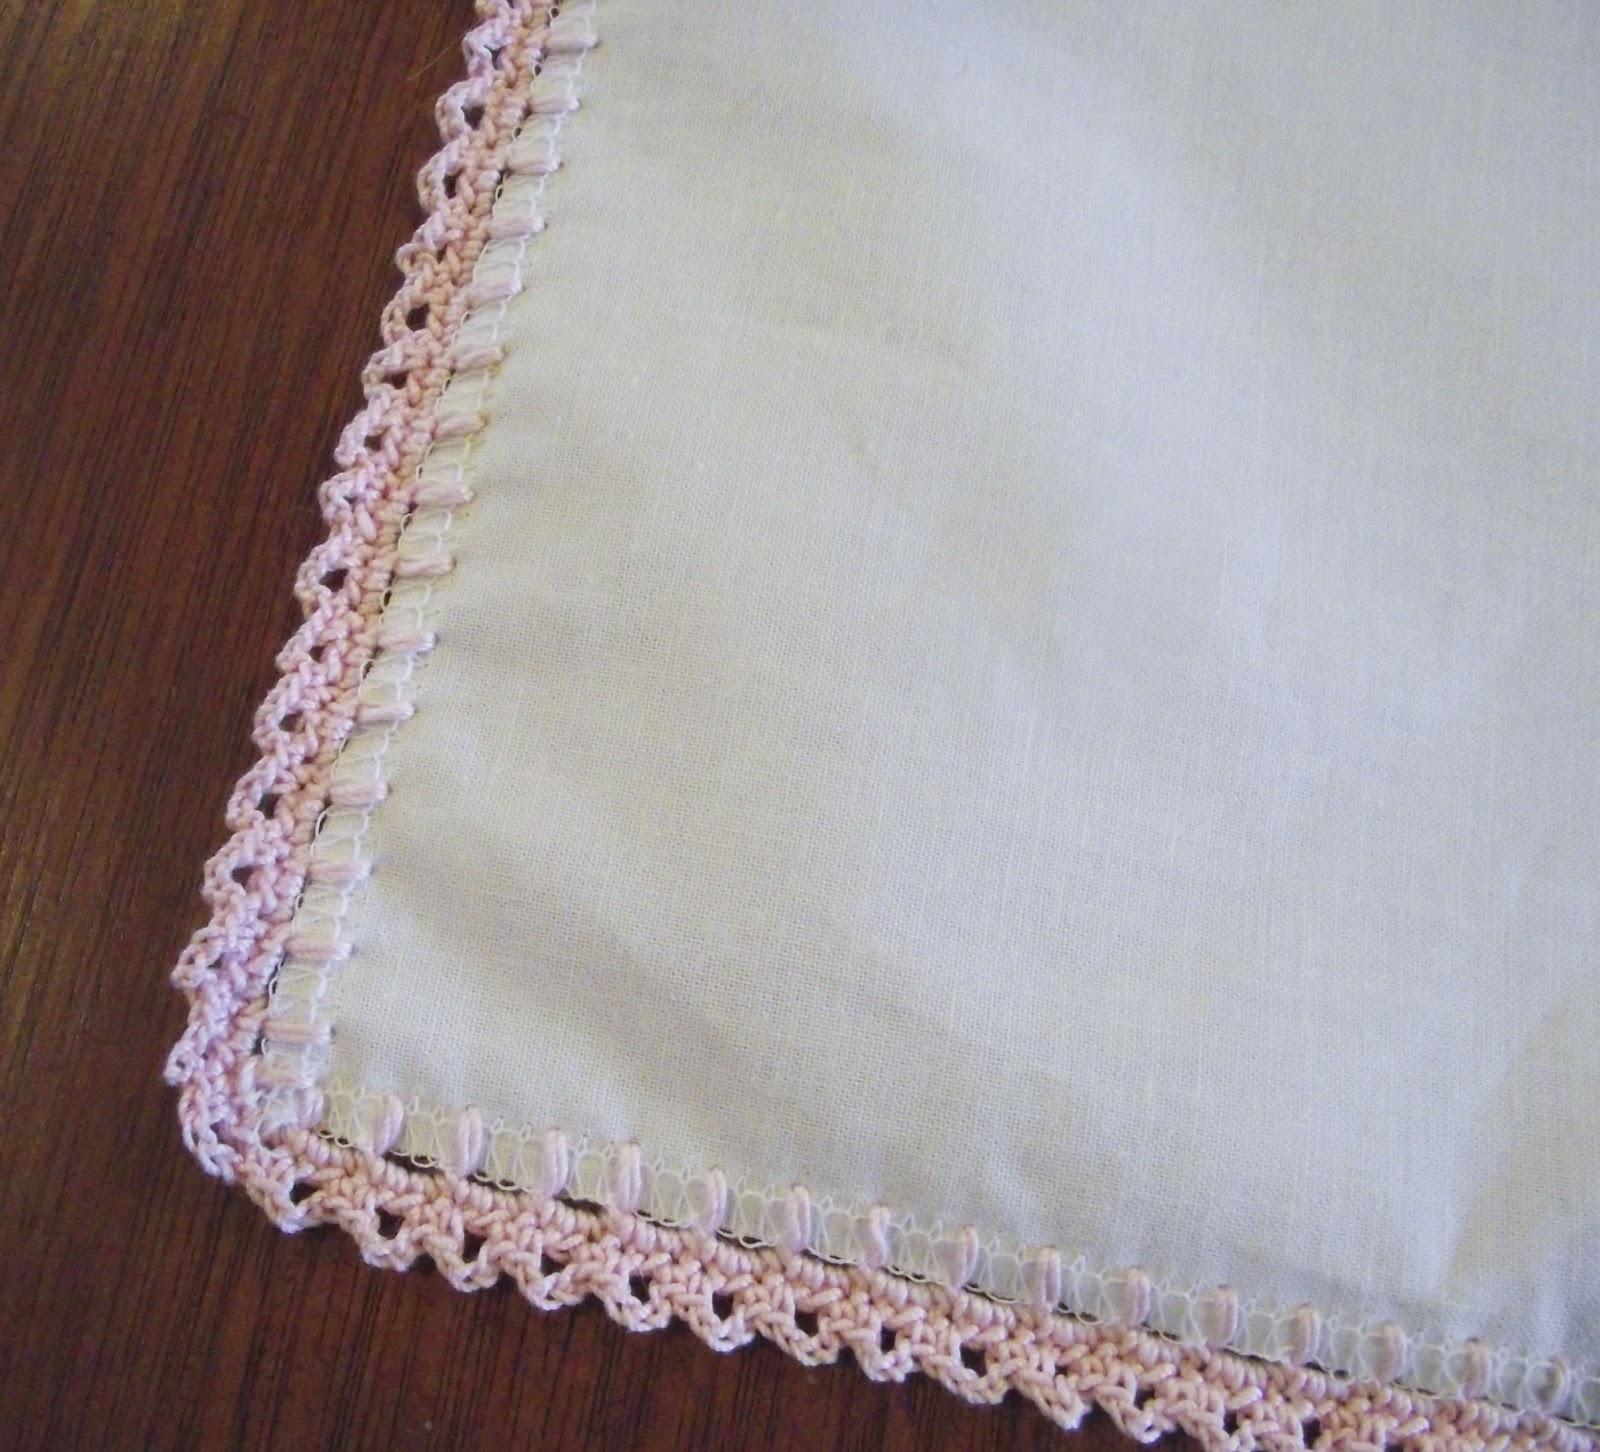 Simple Crochet Edging Patterns : Sara vs. Sarah: Fancy Crochet Edged Hankie - A Tutorial